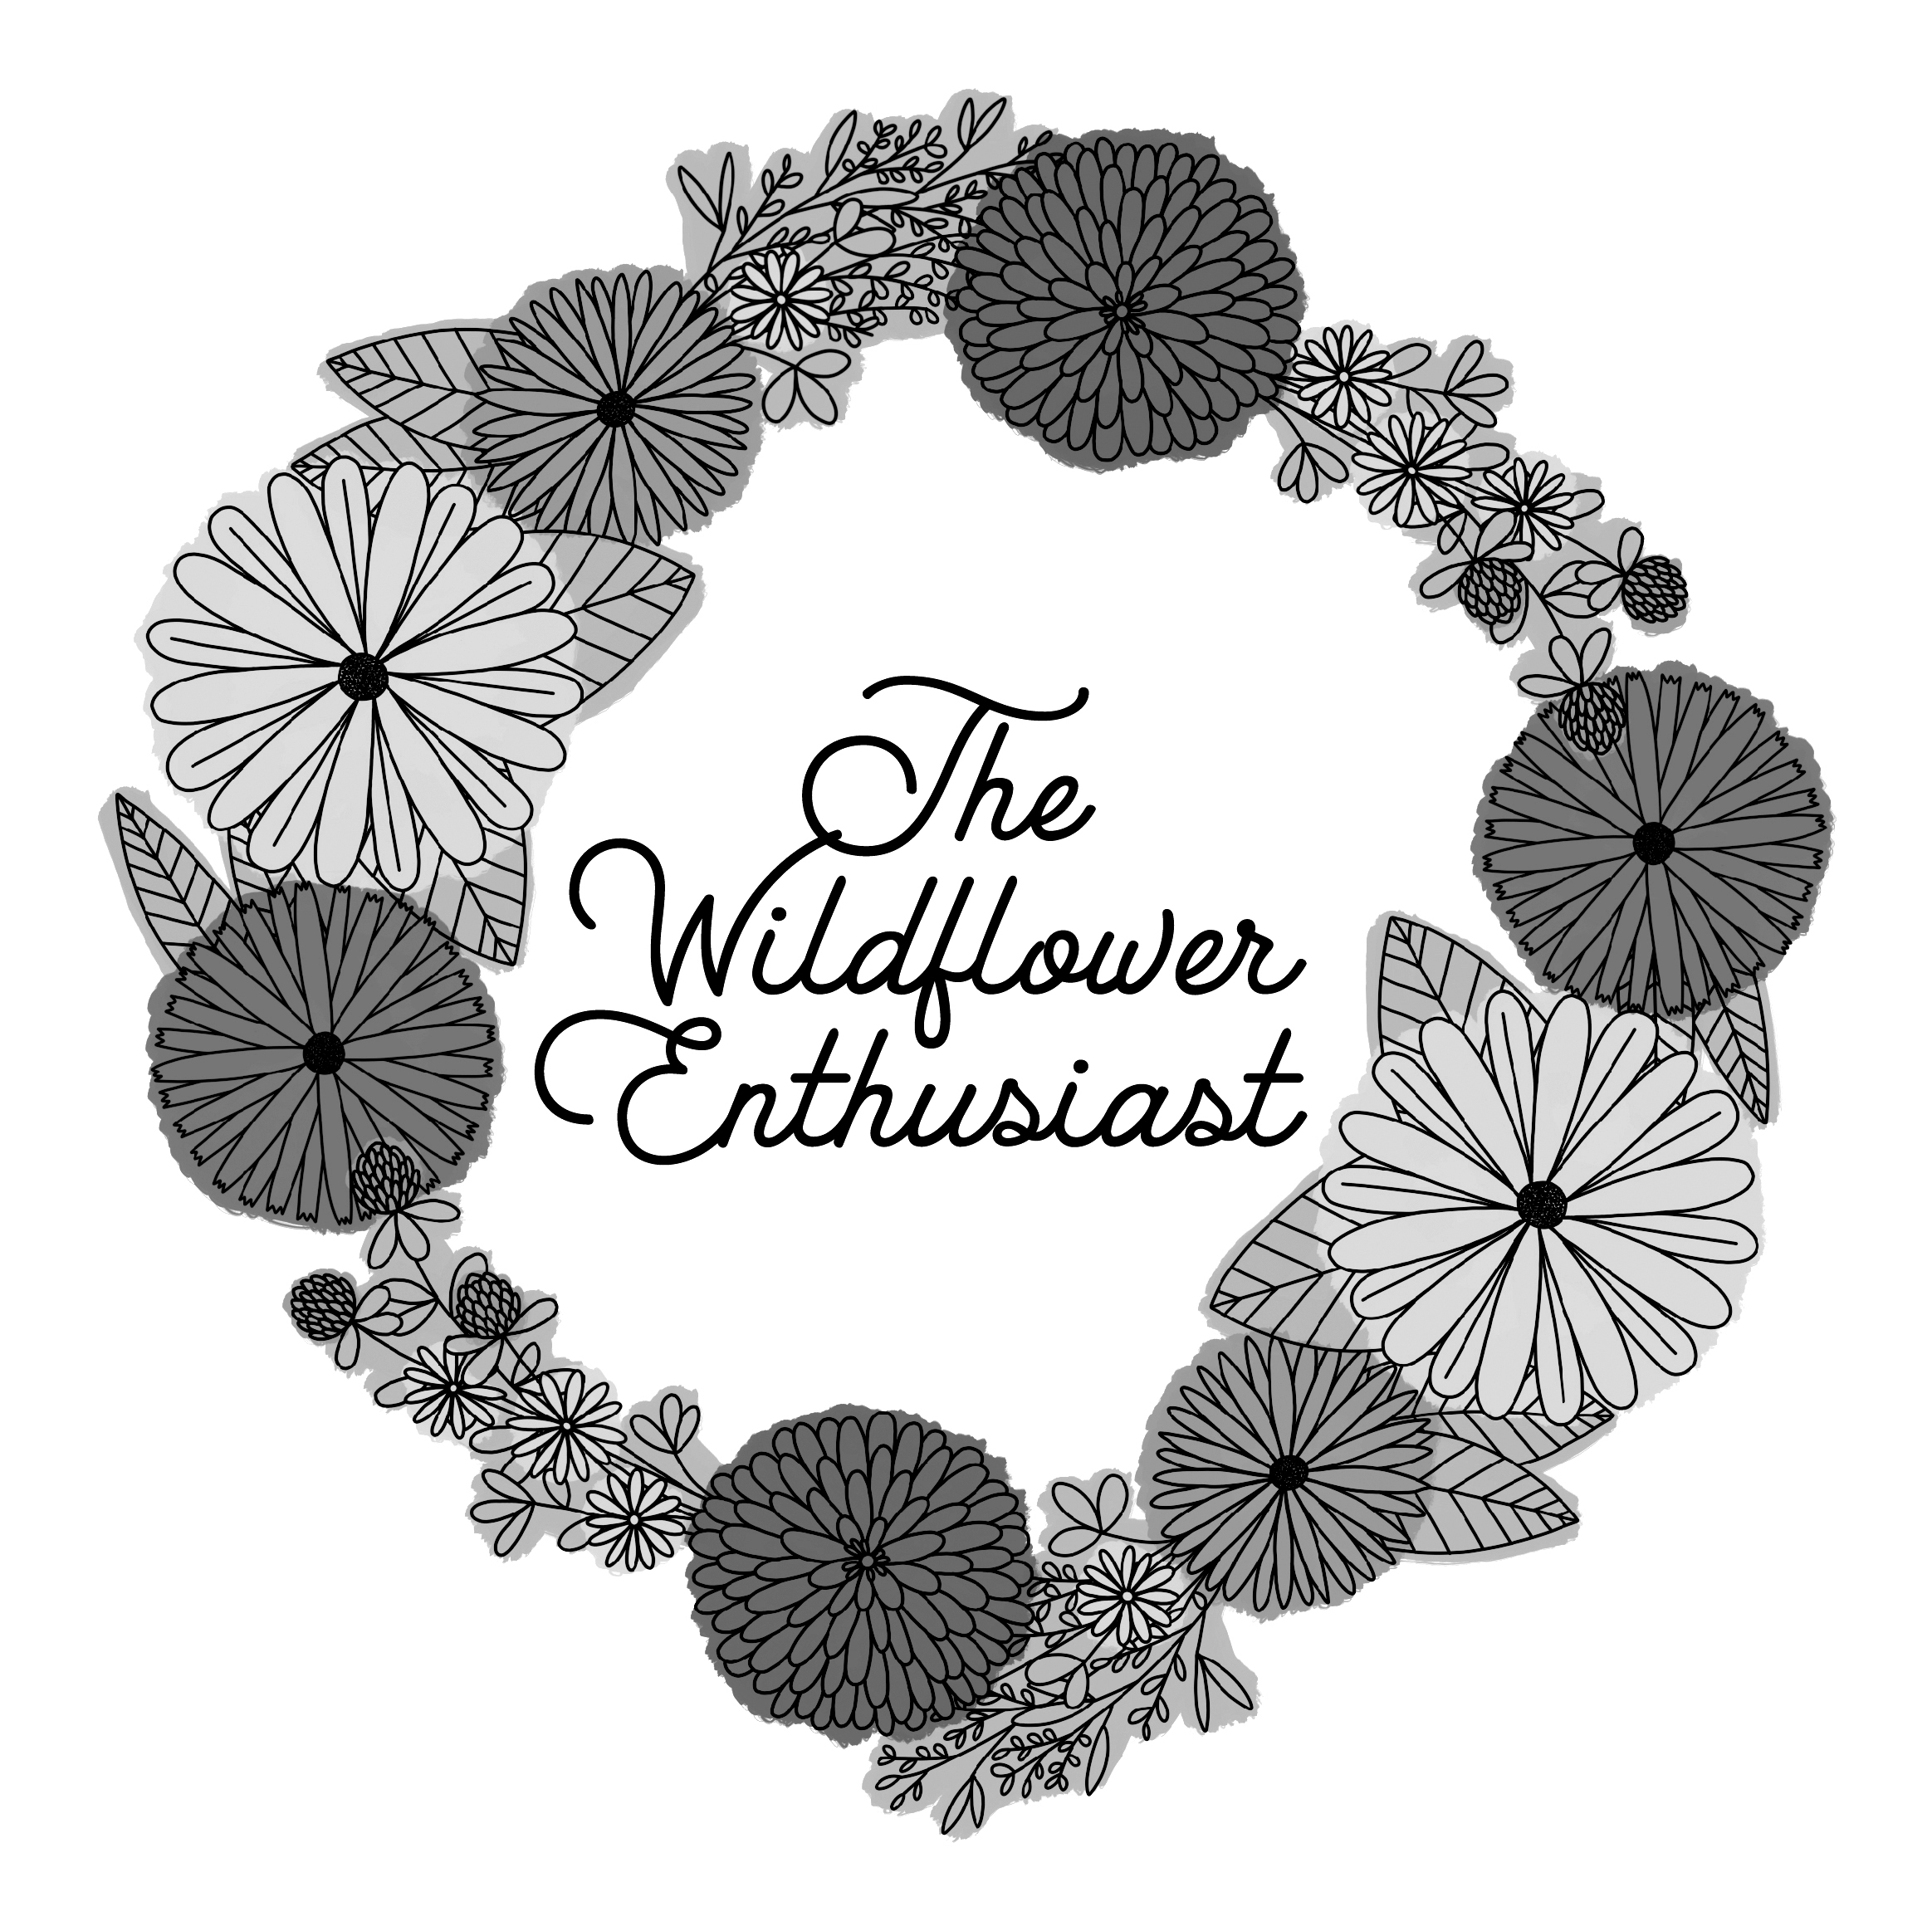 The-Wildflower-Enthusiast-04 (1).jpg